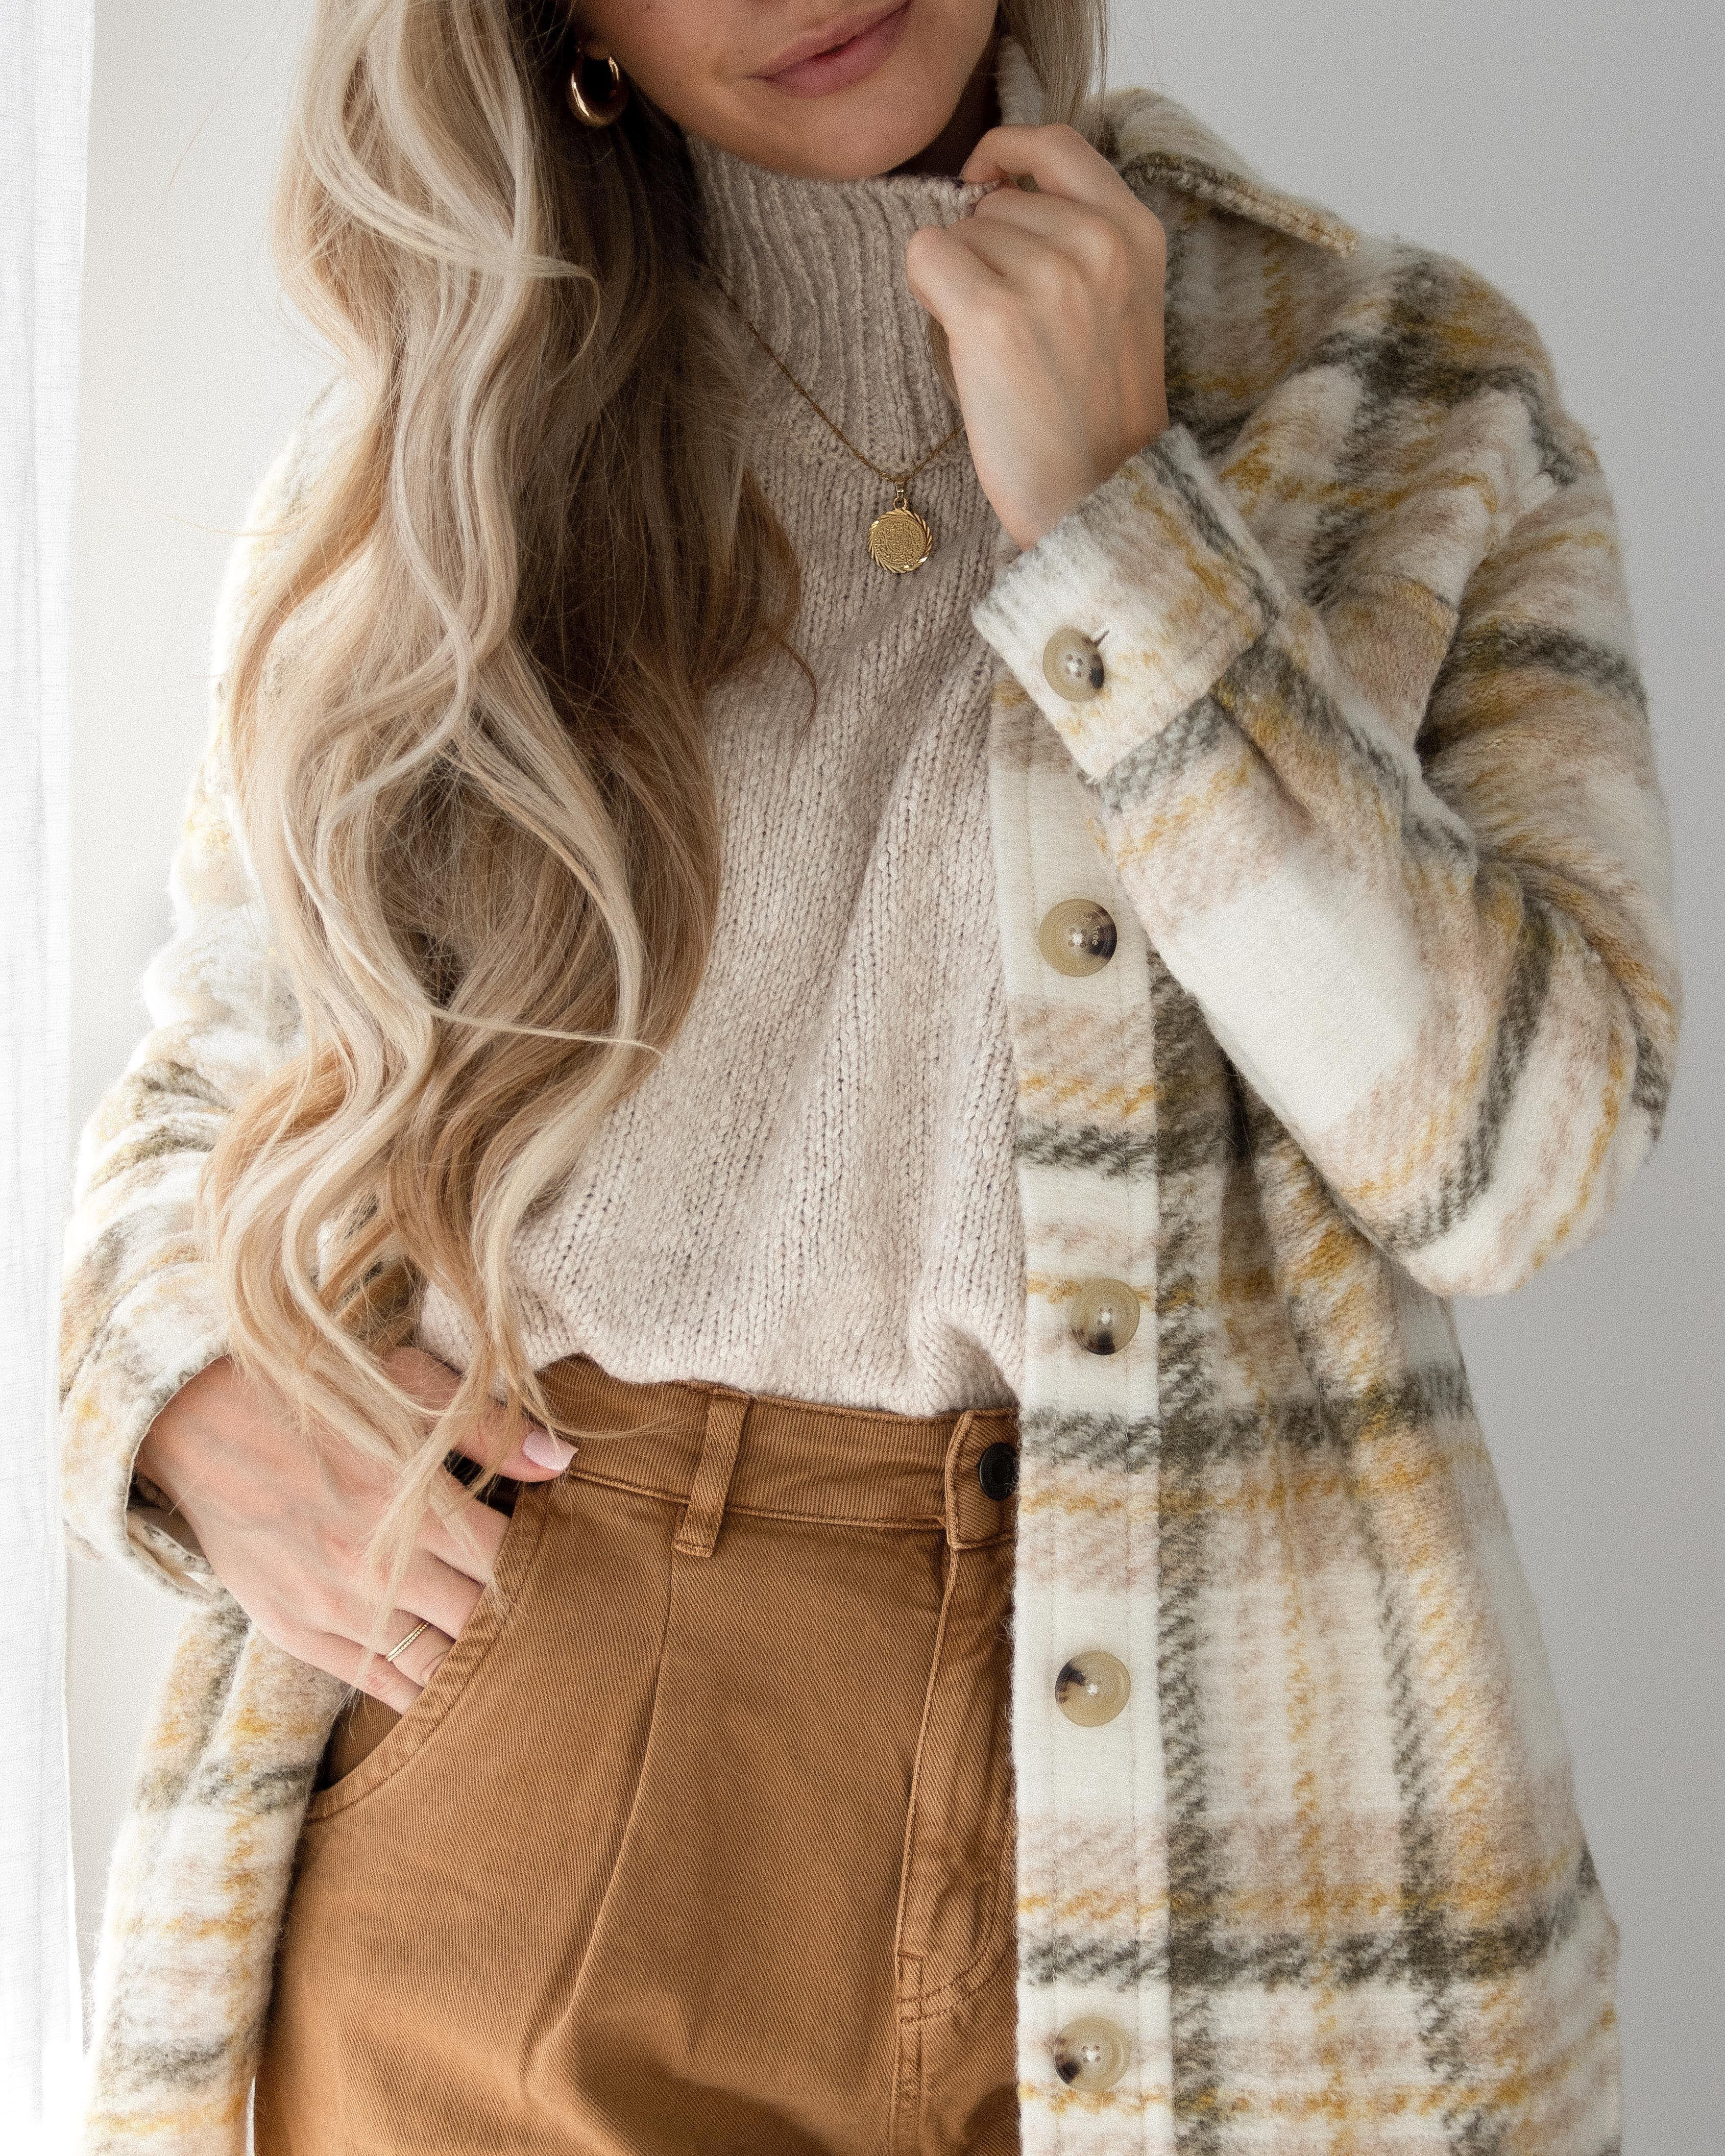 Essayage d'automne 2019 ???? Zara, H & M et Aritzia - #aritzia #automne #essayage - #new #fallbeauty